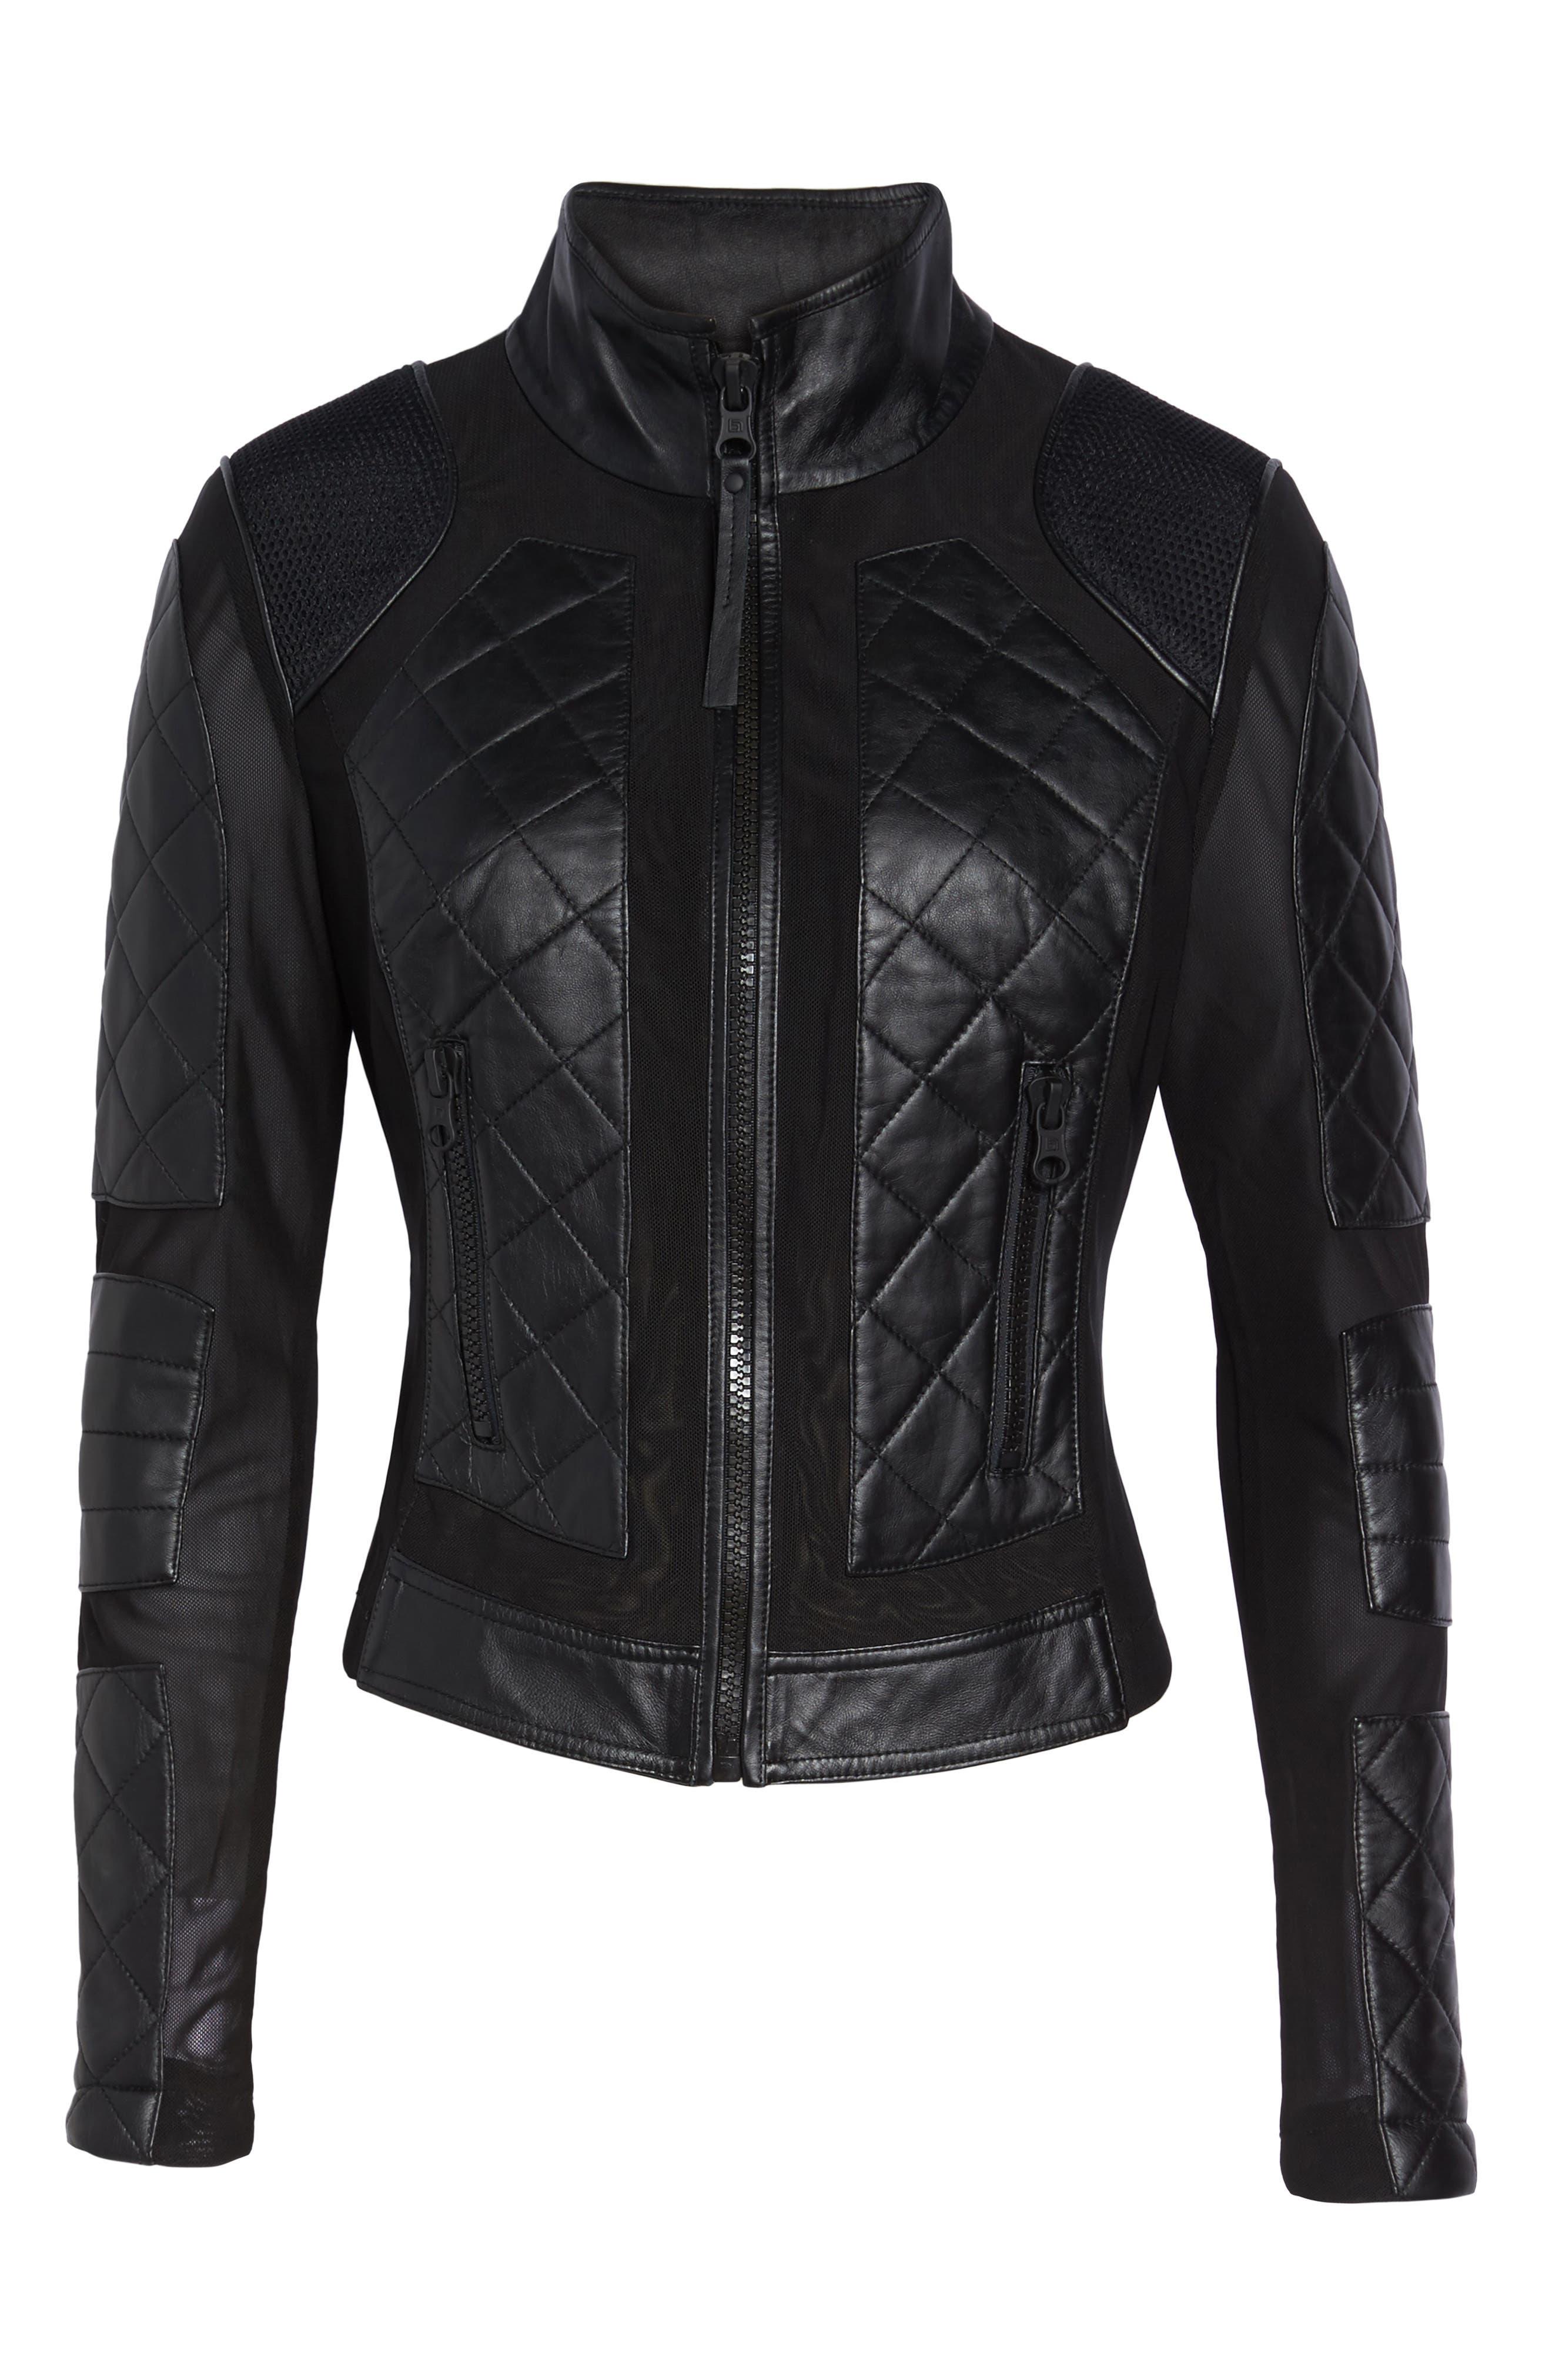 BLANC NOIR, Leather & Mesh Moto Jacket, Alternate thumbnail 6, color, BLACK